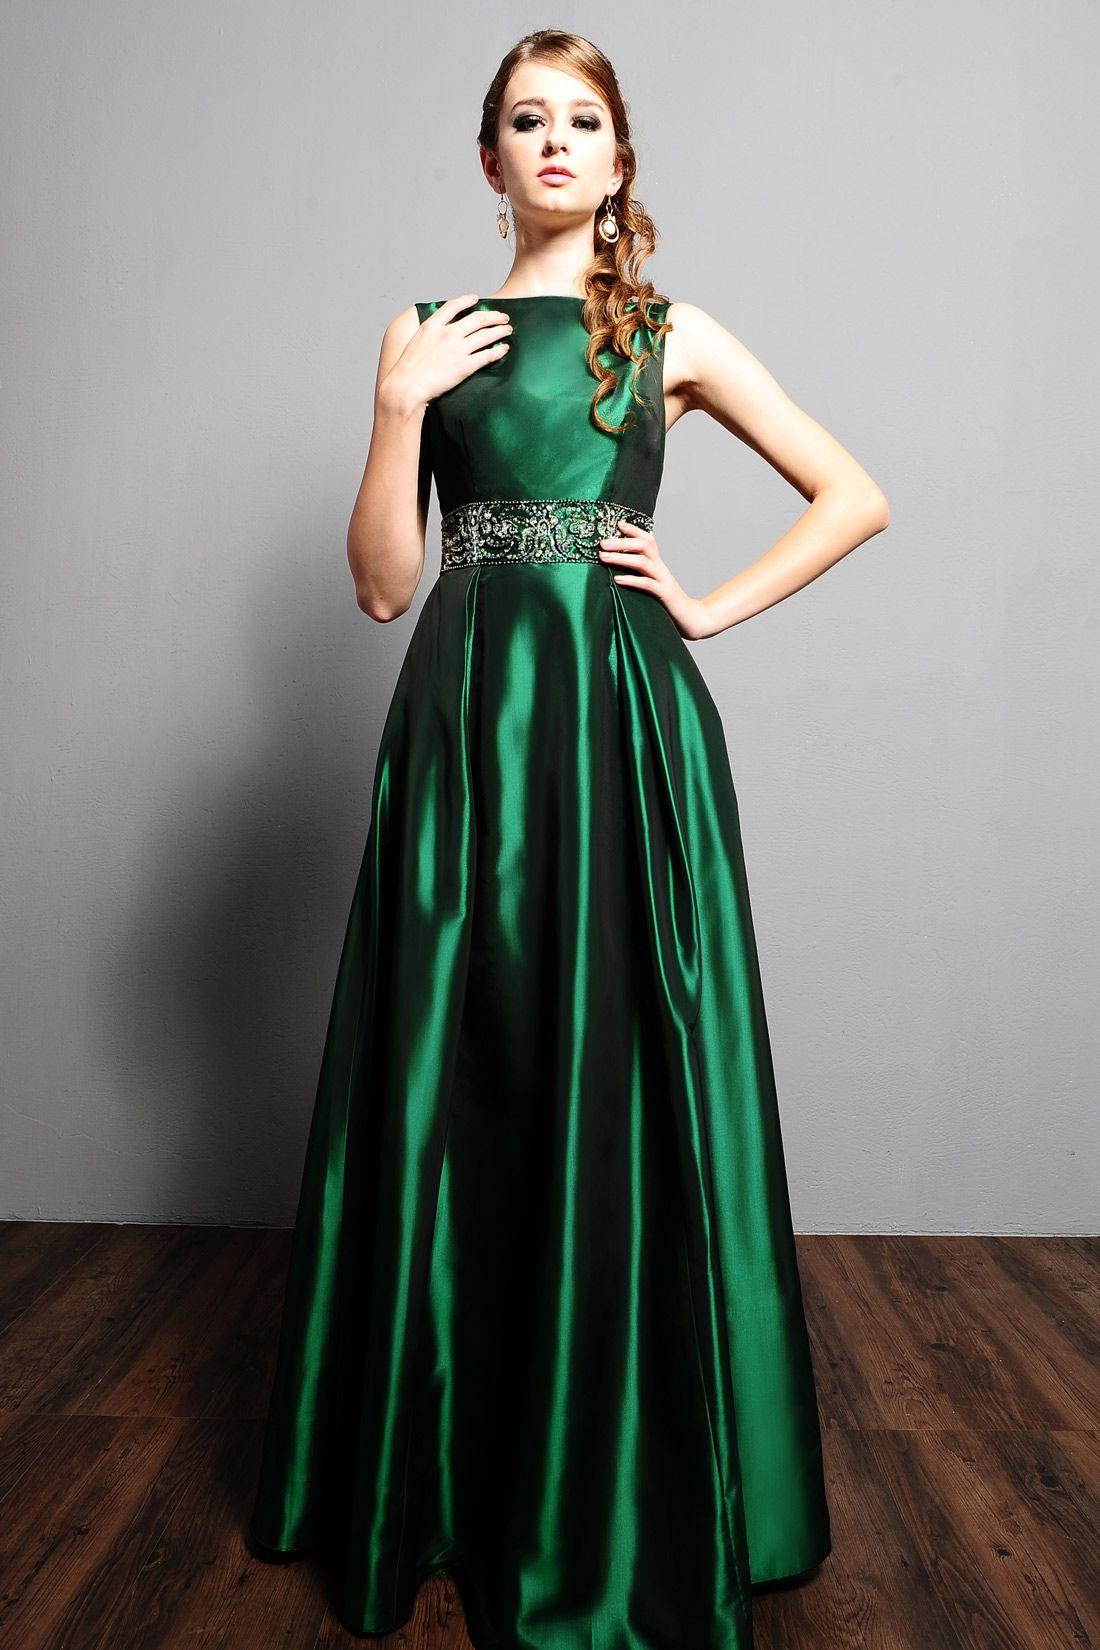 Classy Evening Dresses | Elegant Evening Dresses for Different ...